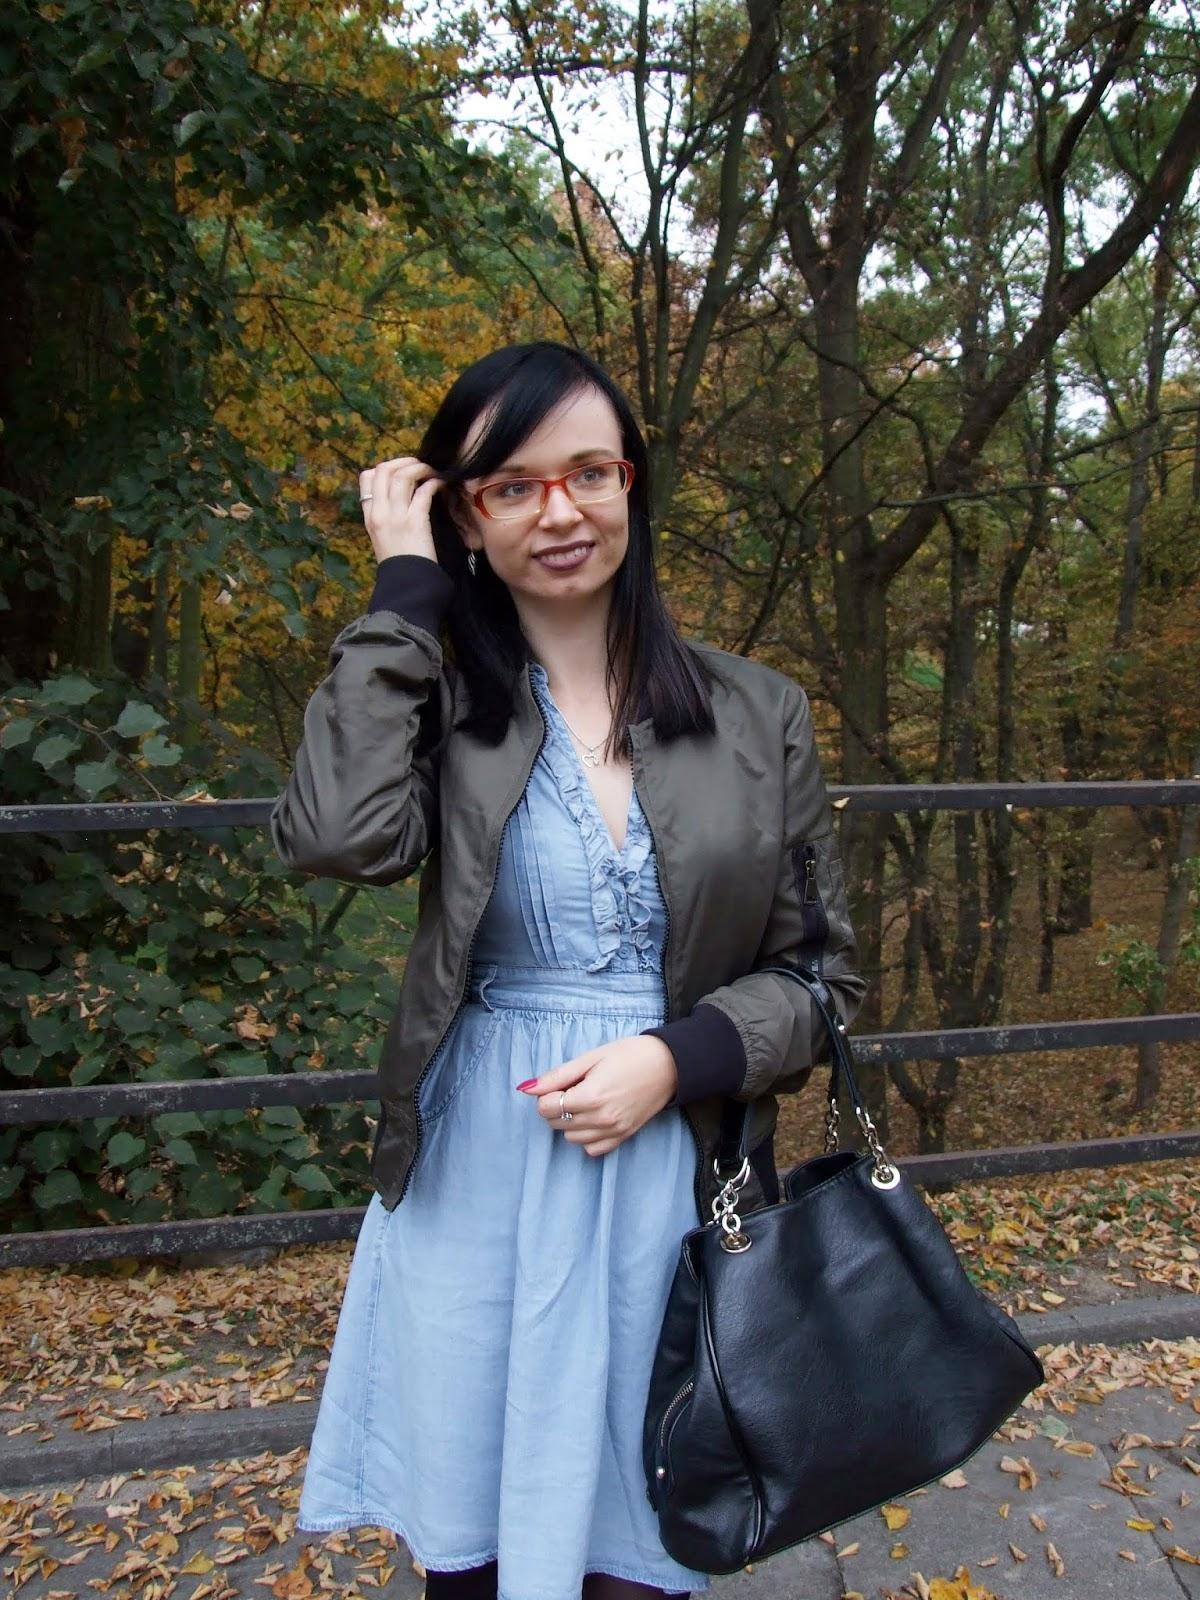 Dżinsowa sukienka i perełka z second handu